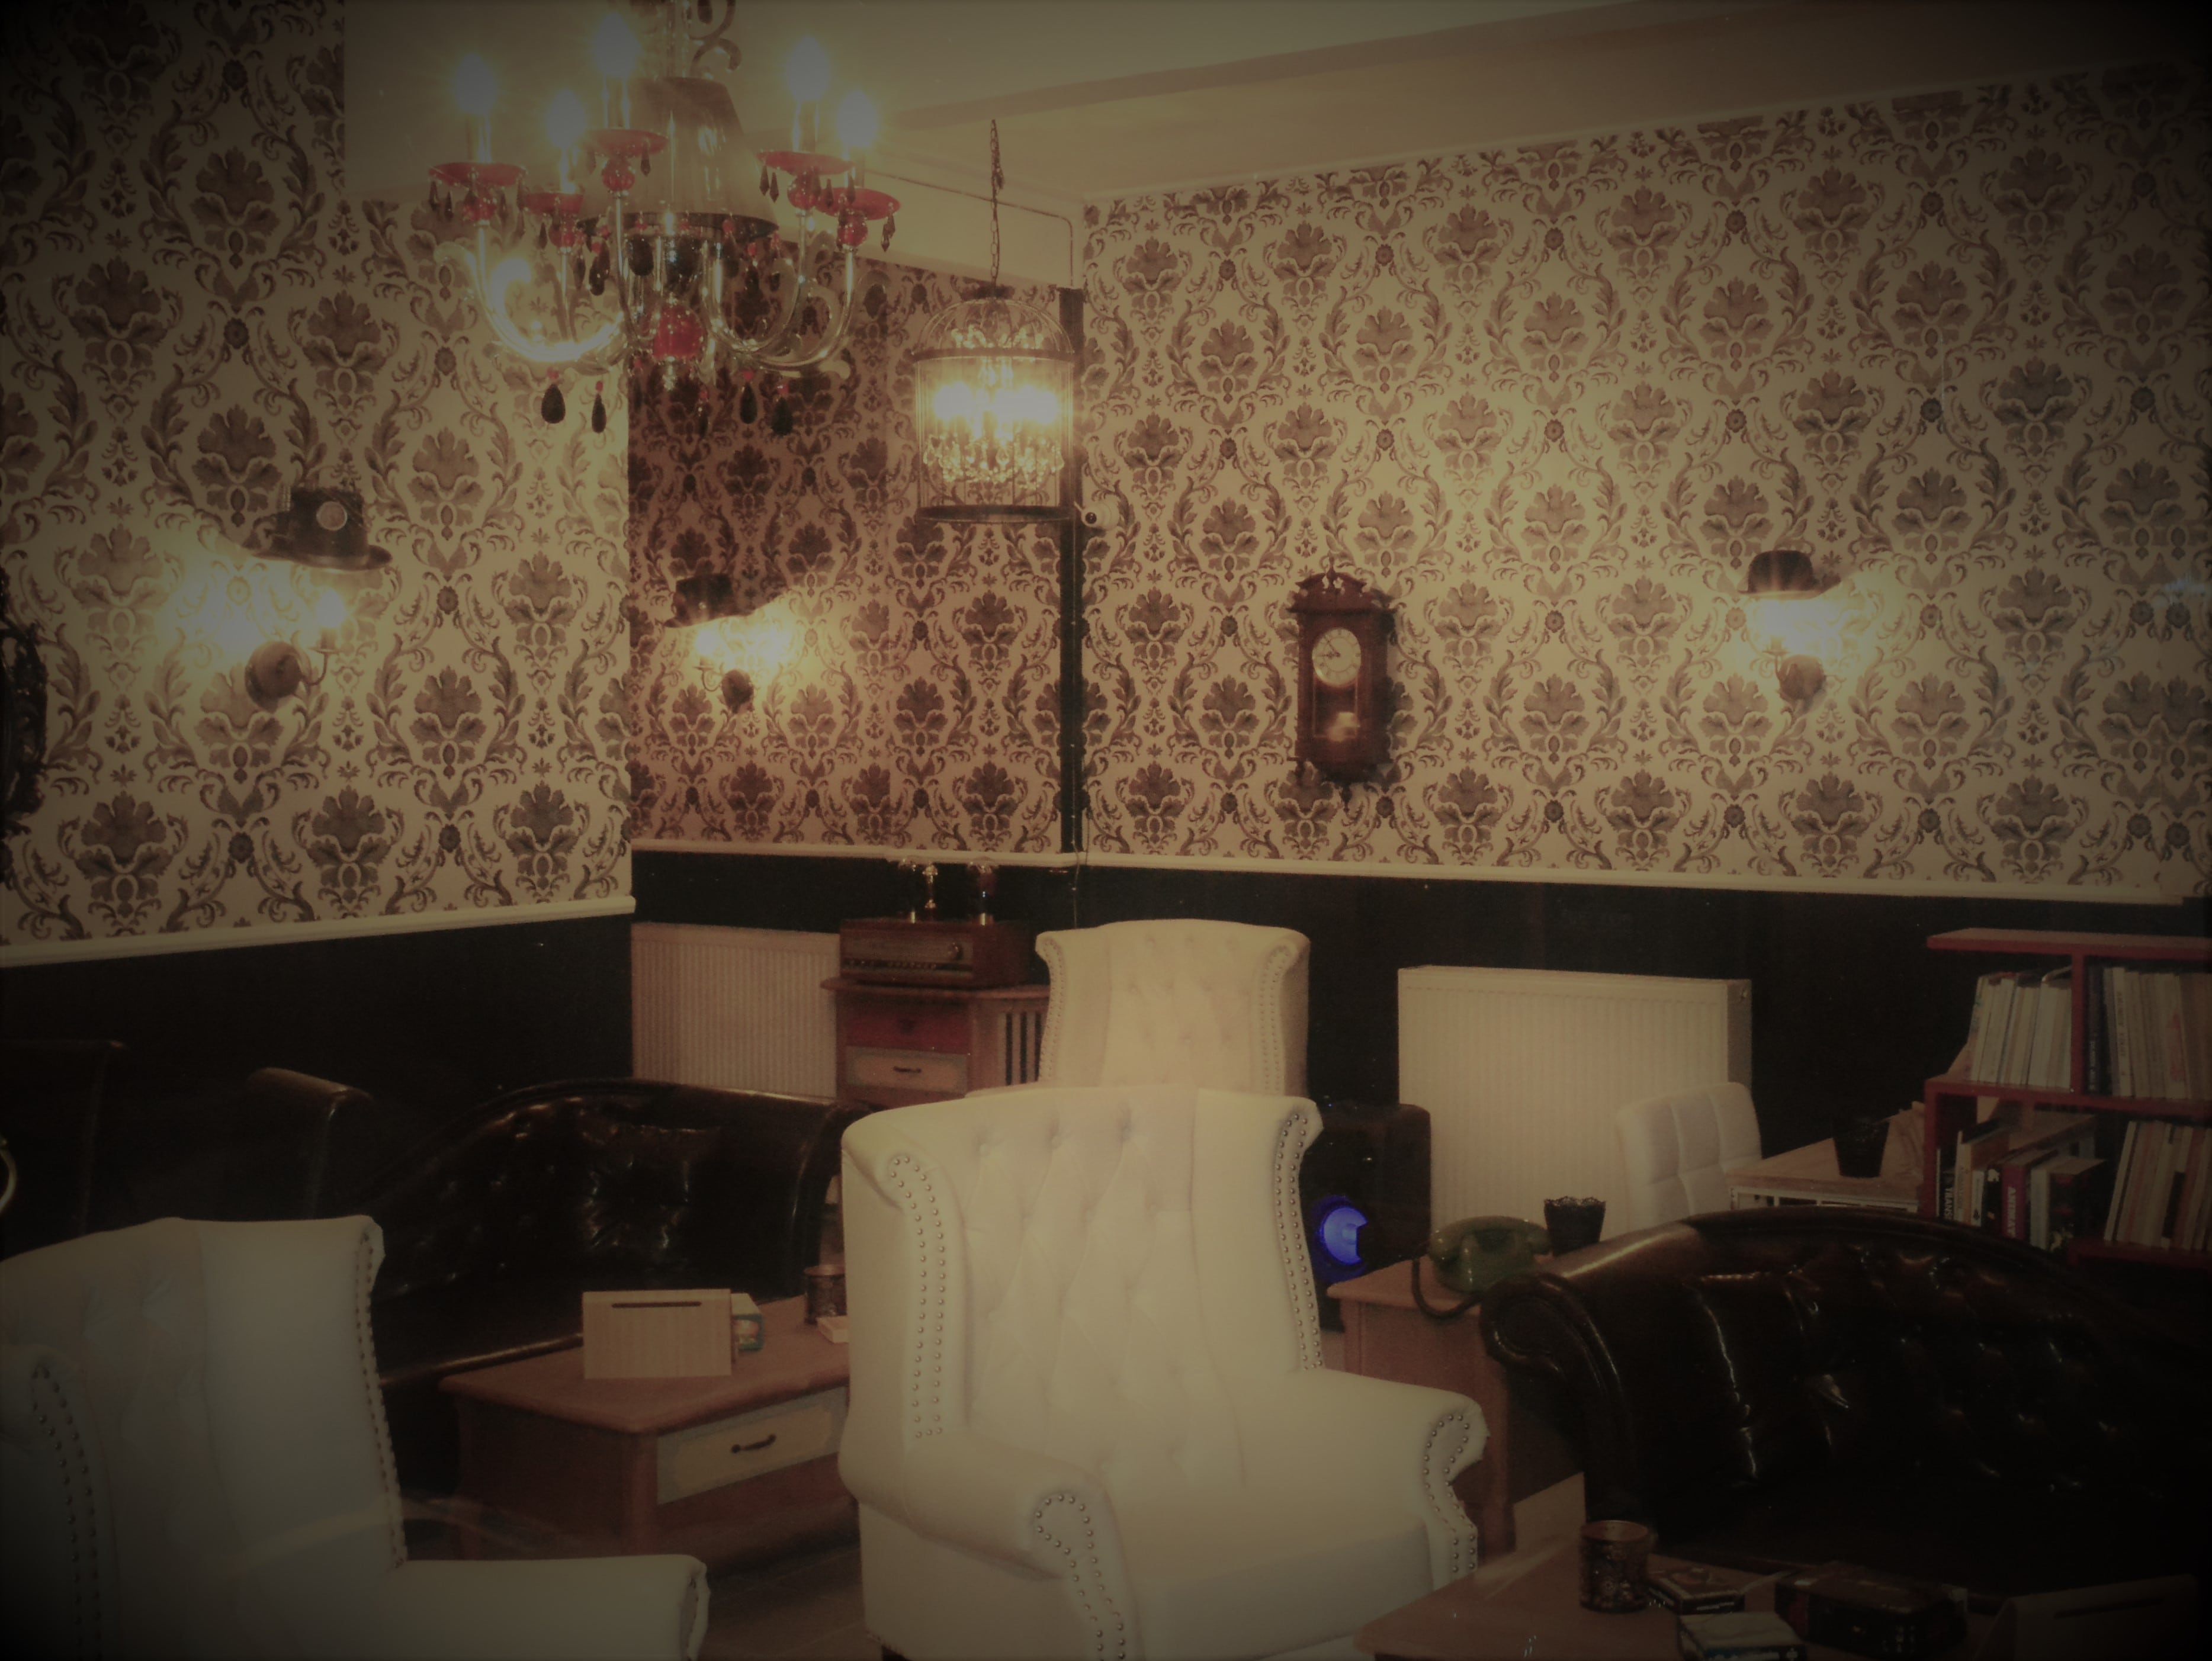 Spookville rooms 3